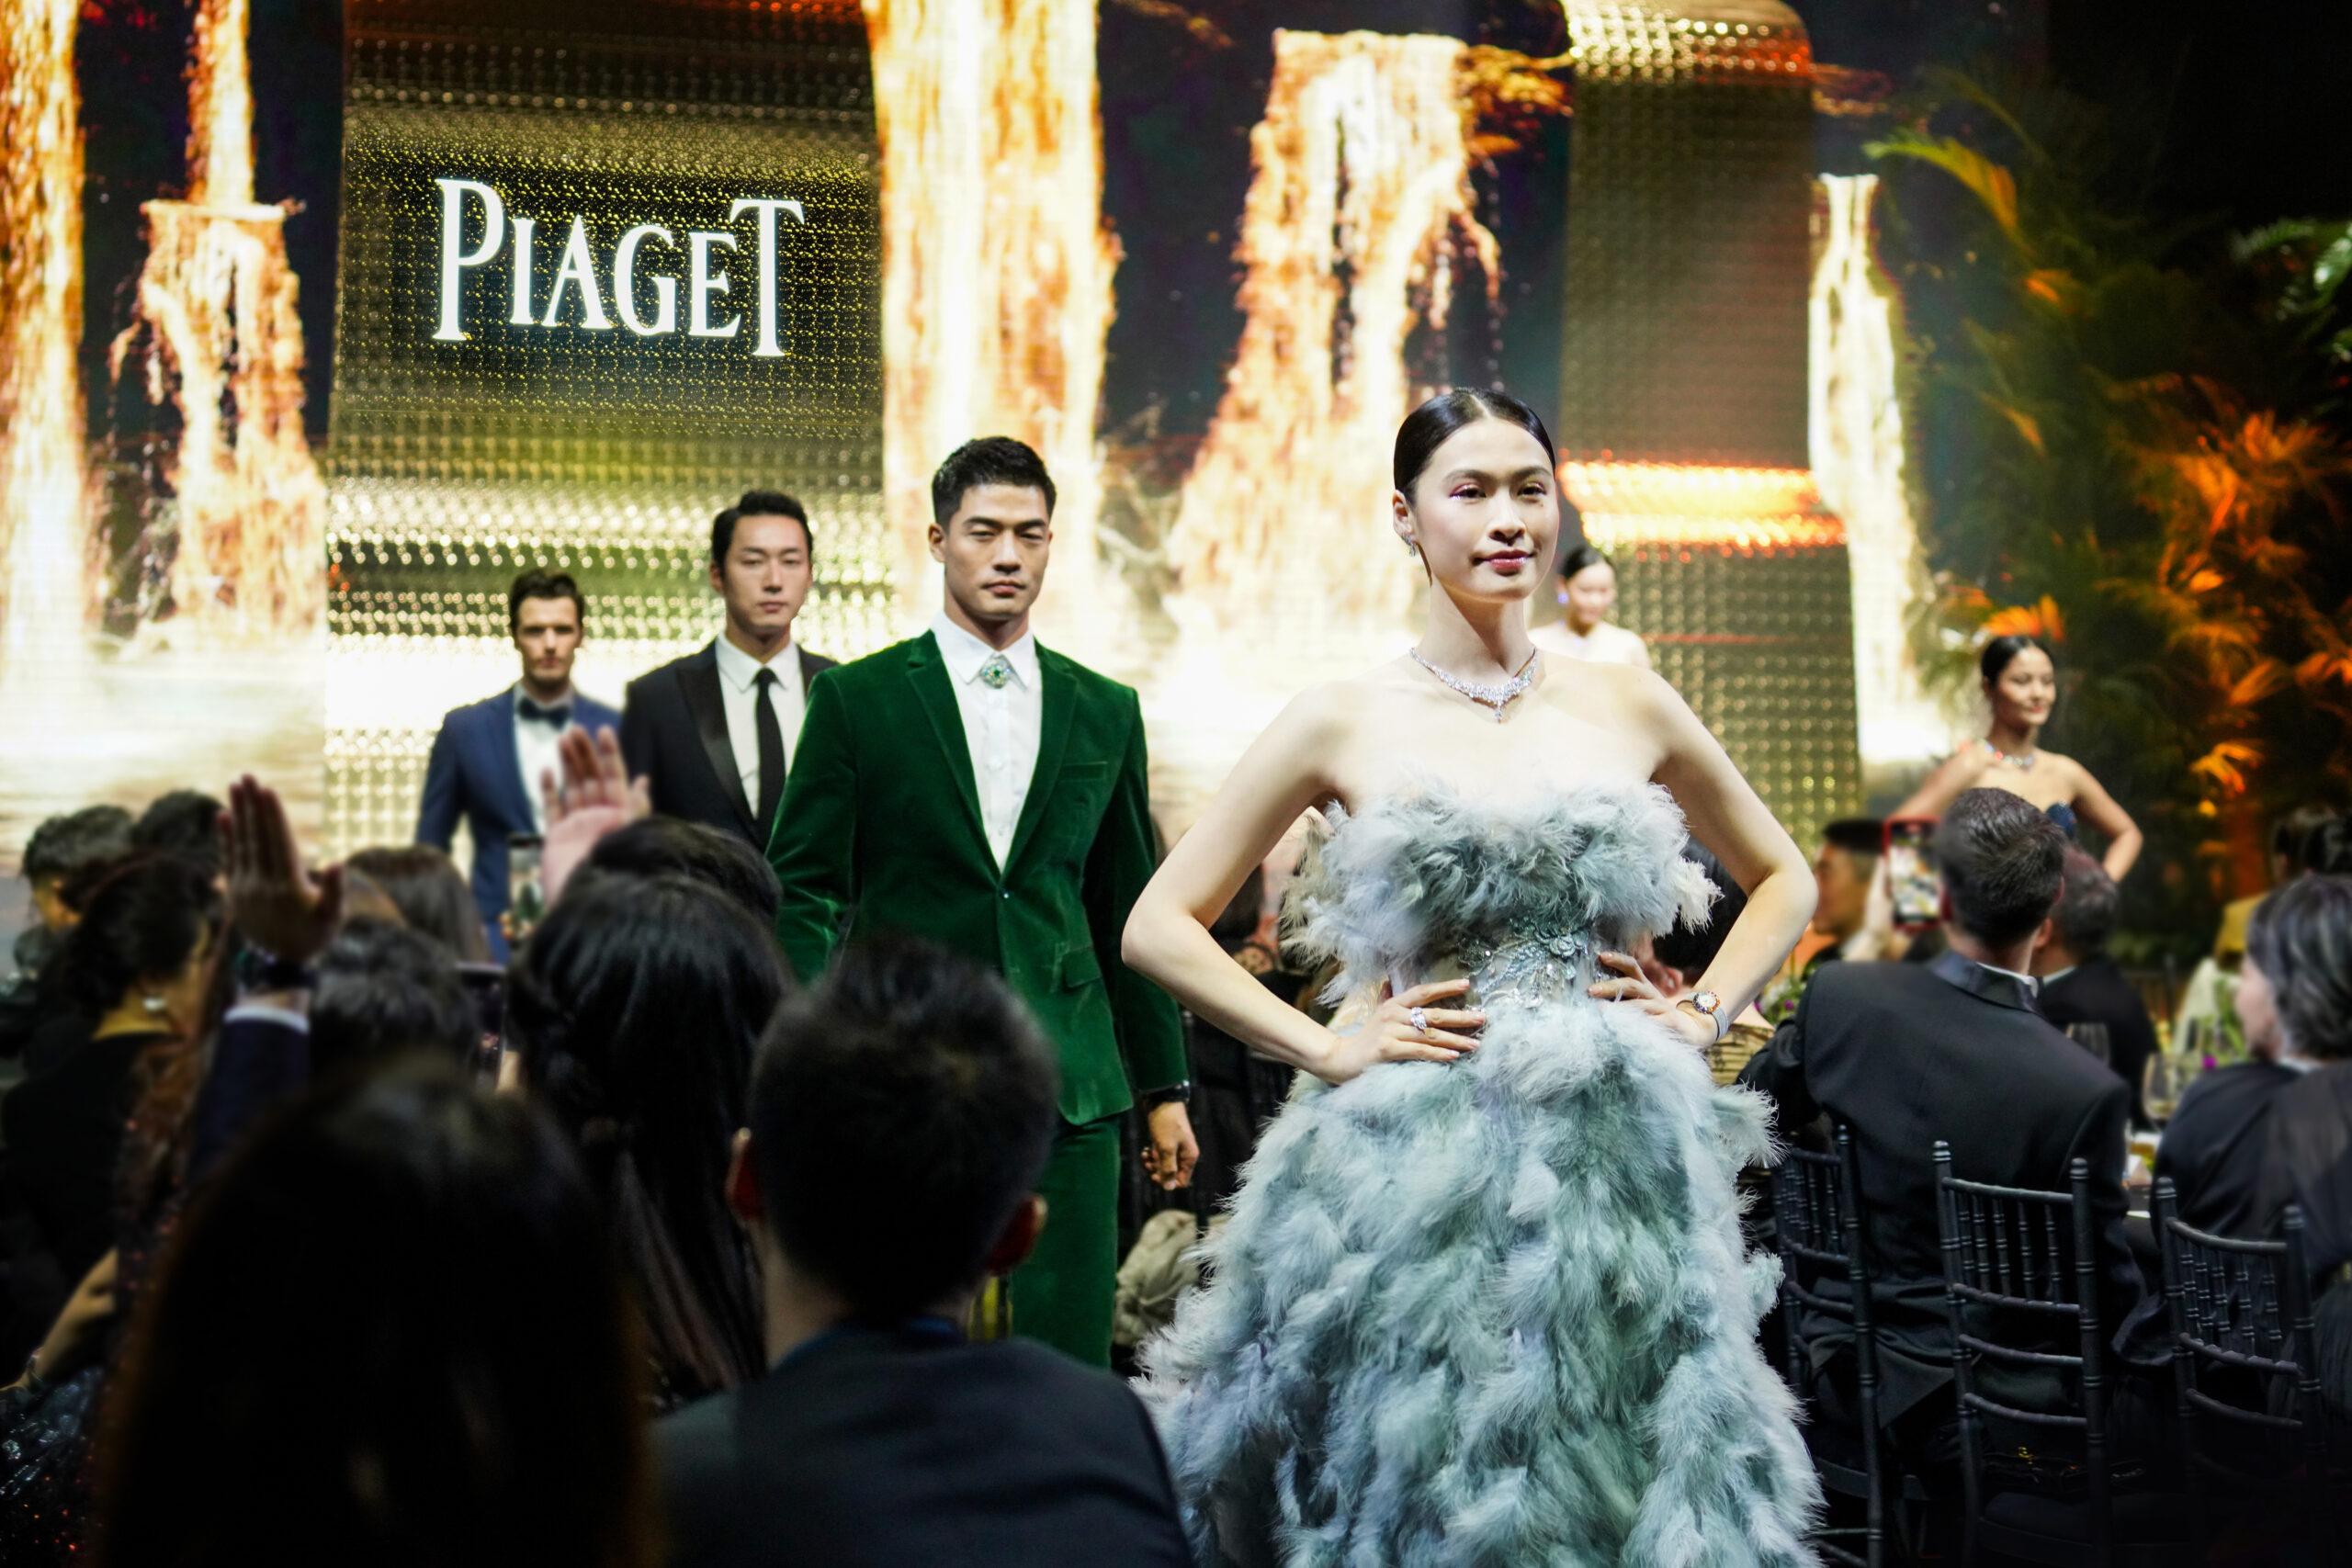 Piaget HJ Exhibition & Gala Dinner December 10th-12th Hanghzou – 7